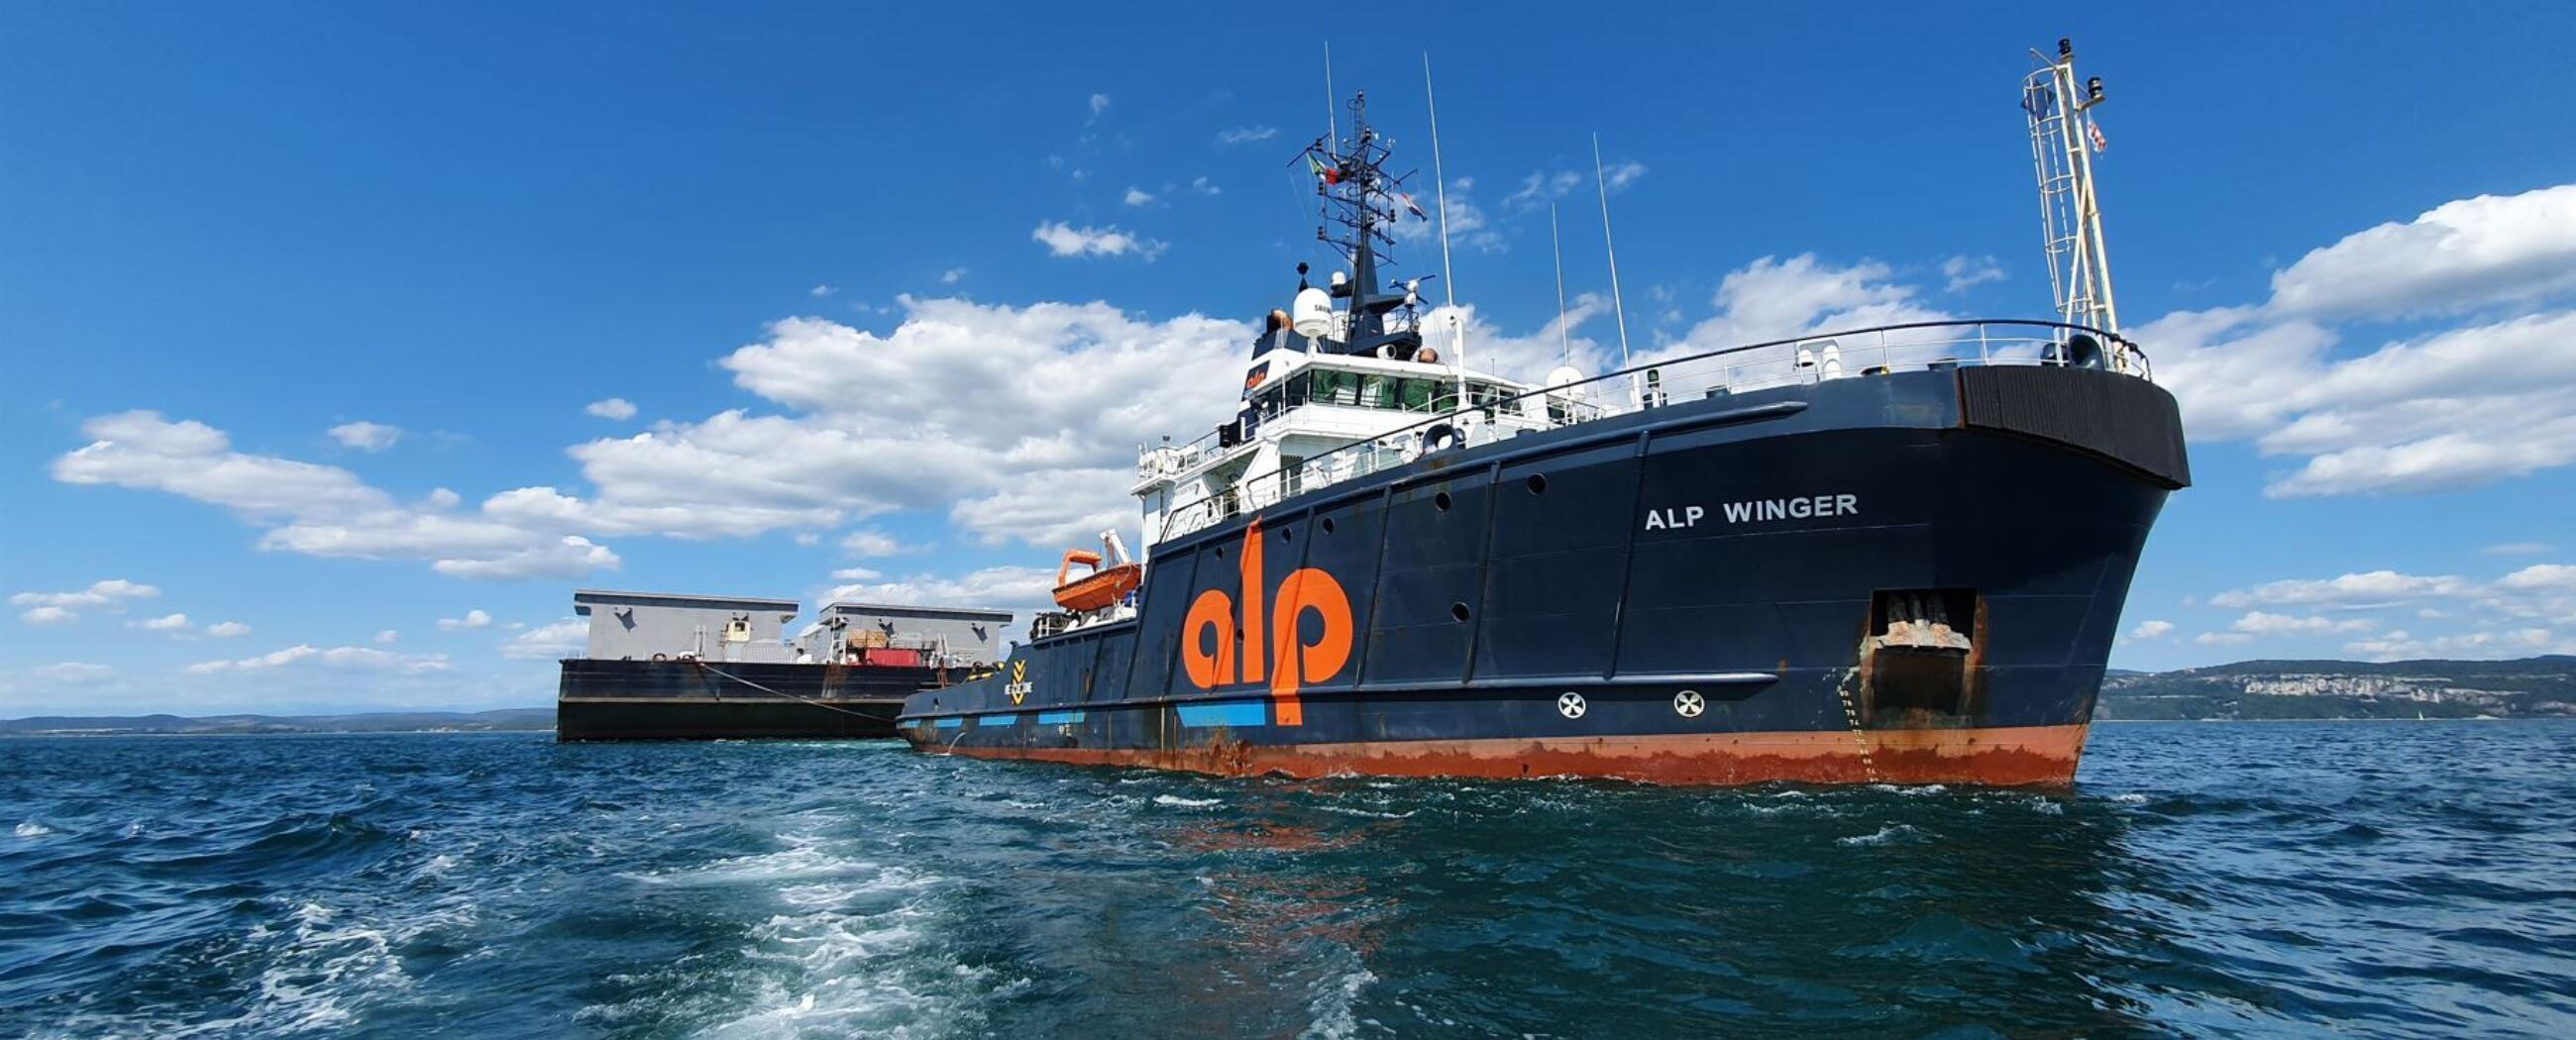 ALP-Winger-towing-Iron-Lady-Allseas-Monfalcone-Rotterdam-08-2021_LR.JPG